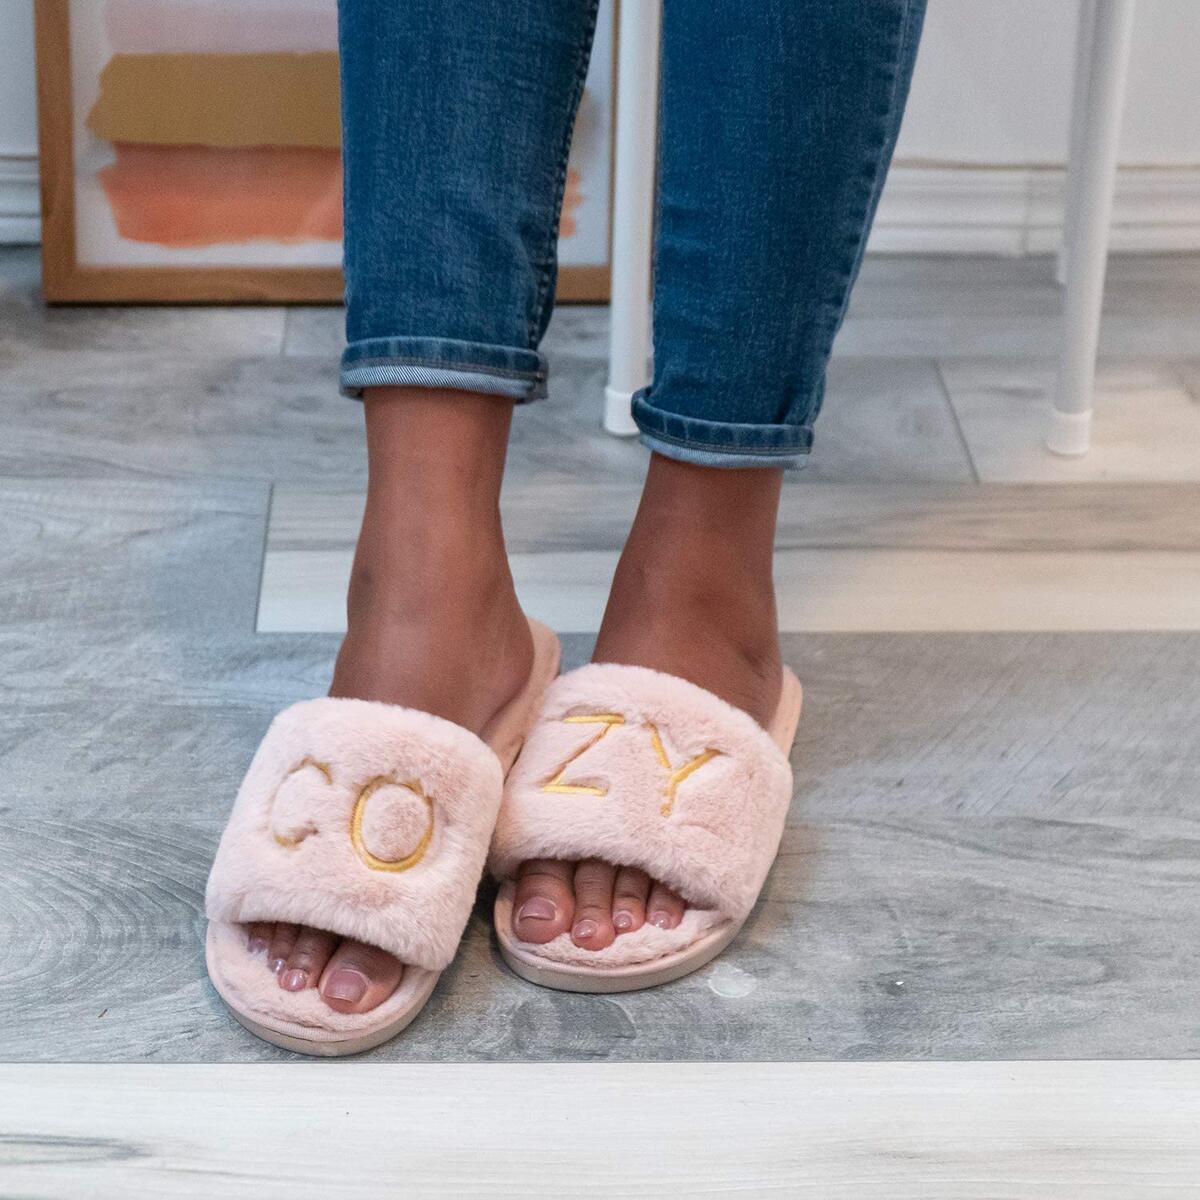 Embroidered Fuzzy Slippers - Cozy Warm Fluffy Faux Fur Memory Foam Slipper